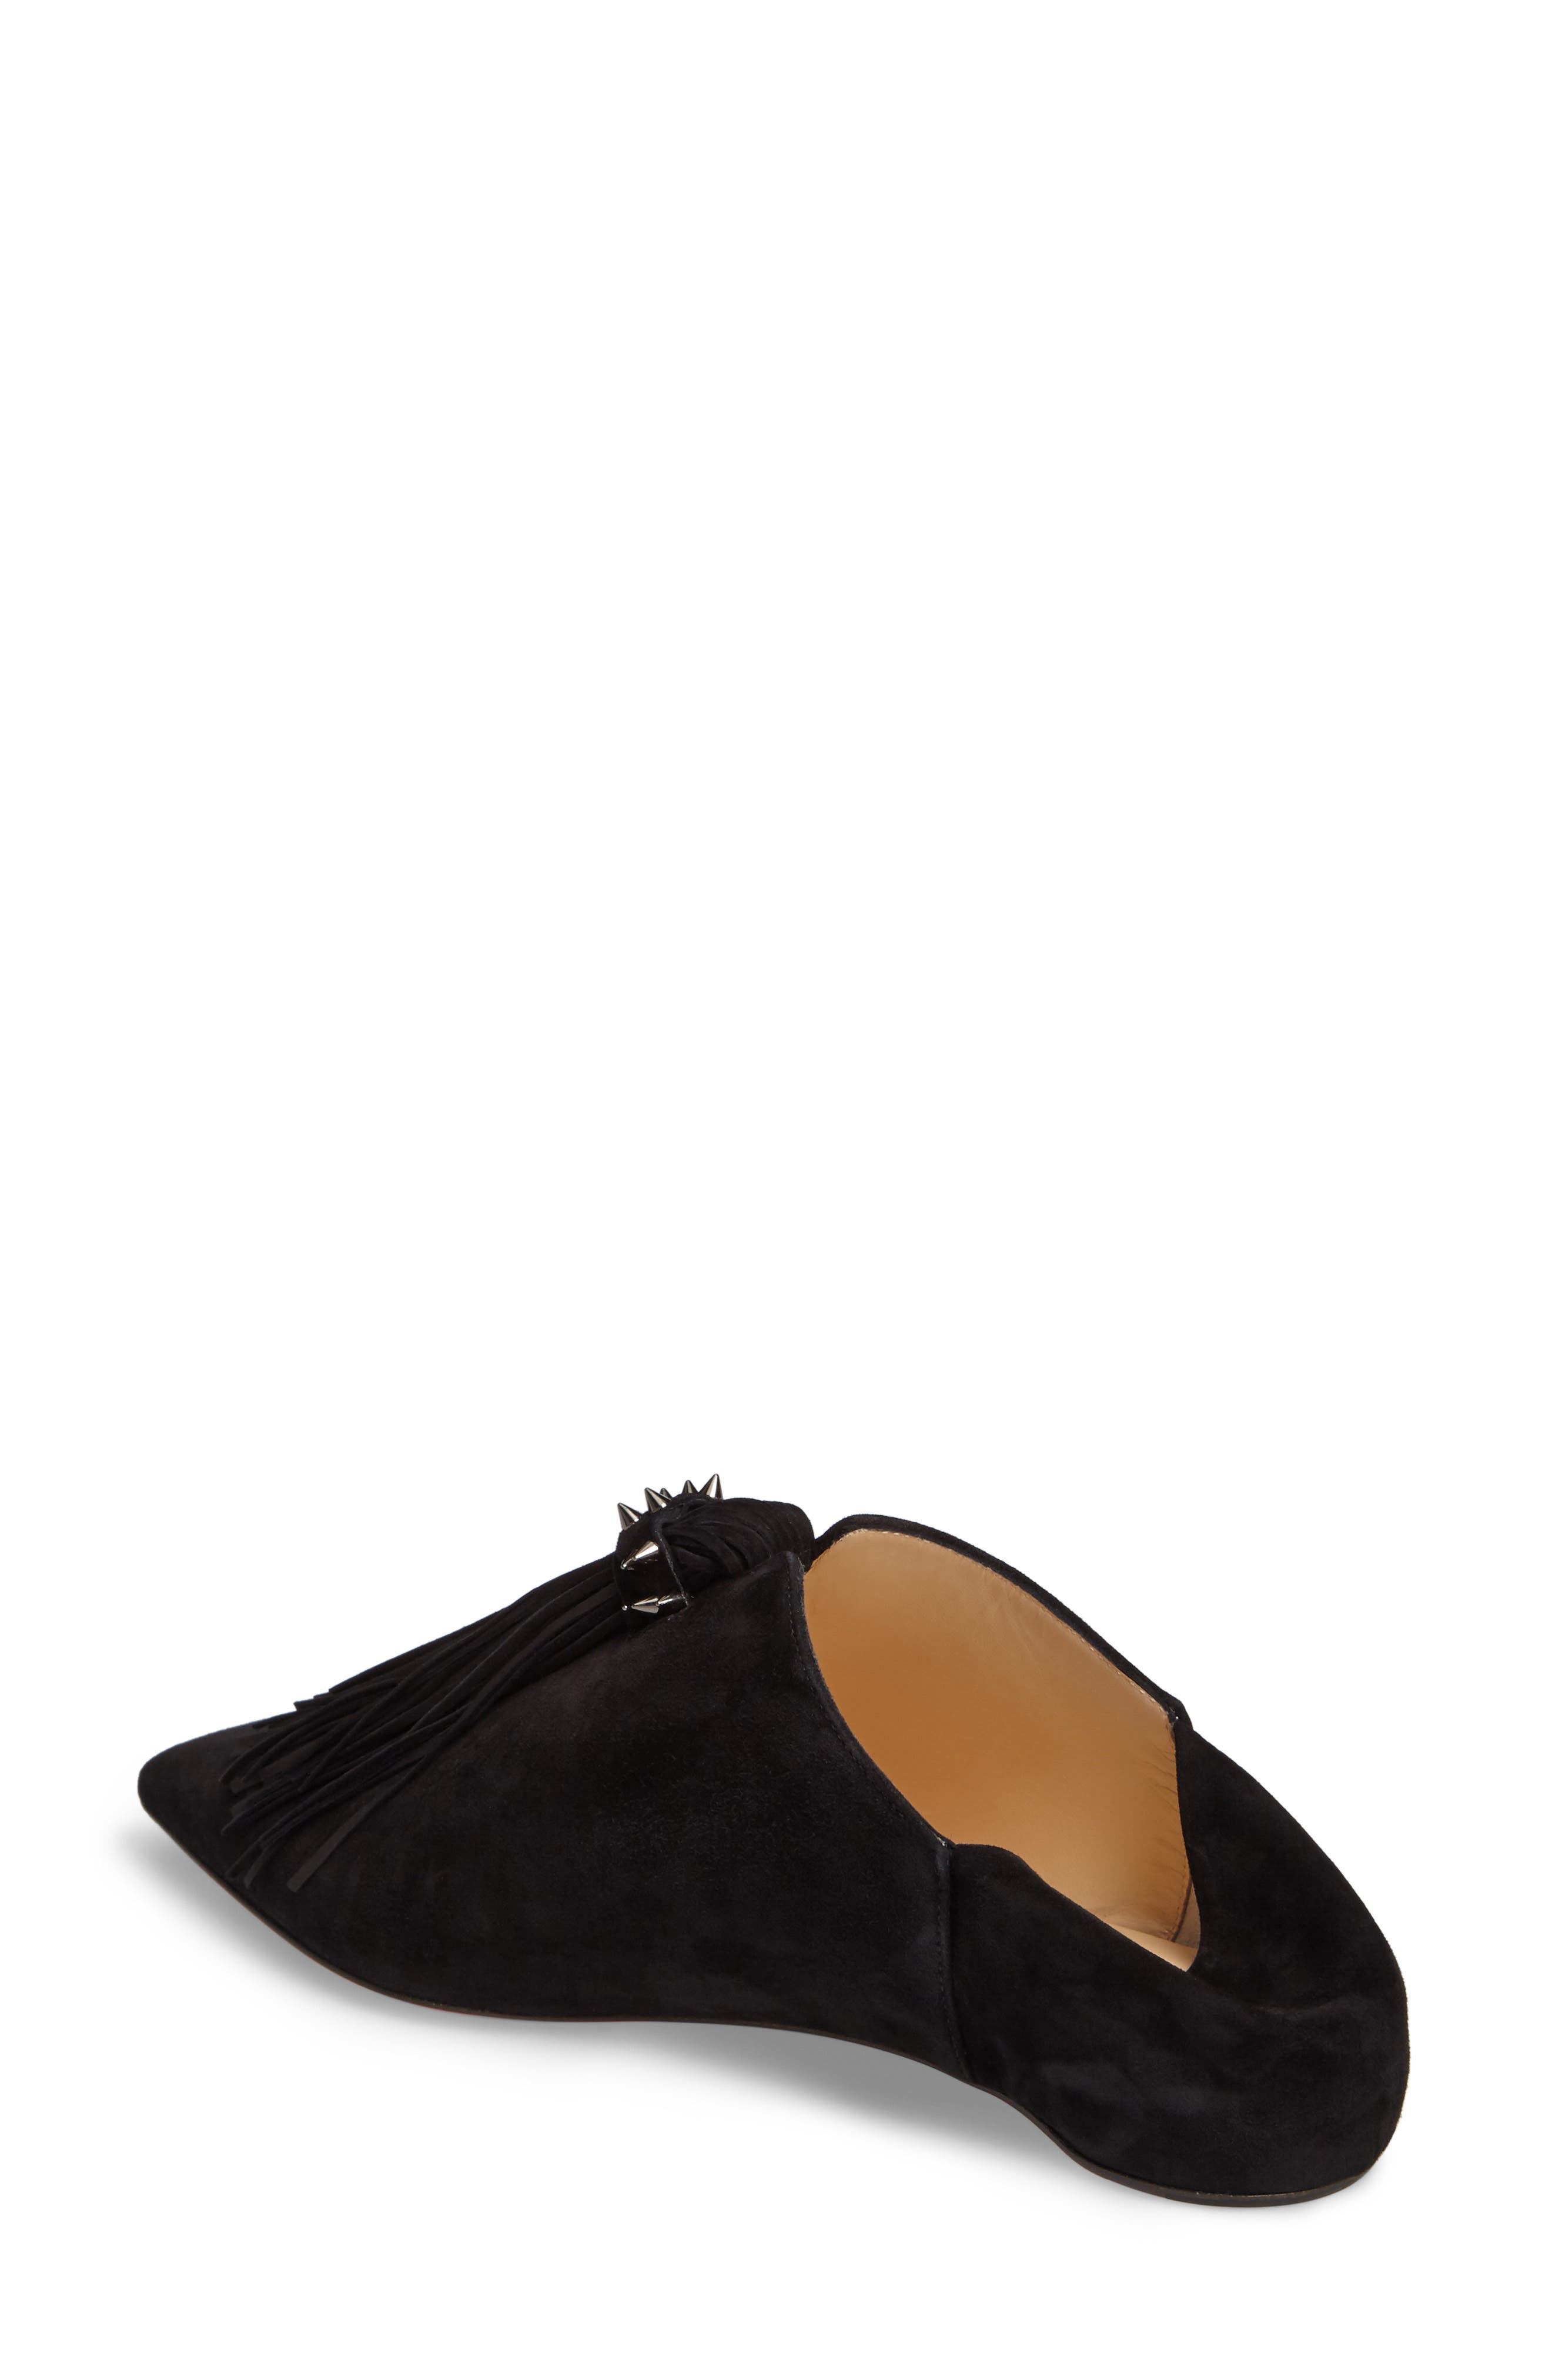 Medinana Convertible Loafer,                             Alternate thumbnail 3, color,                             001